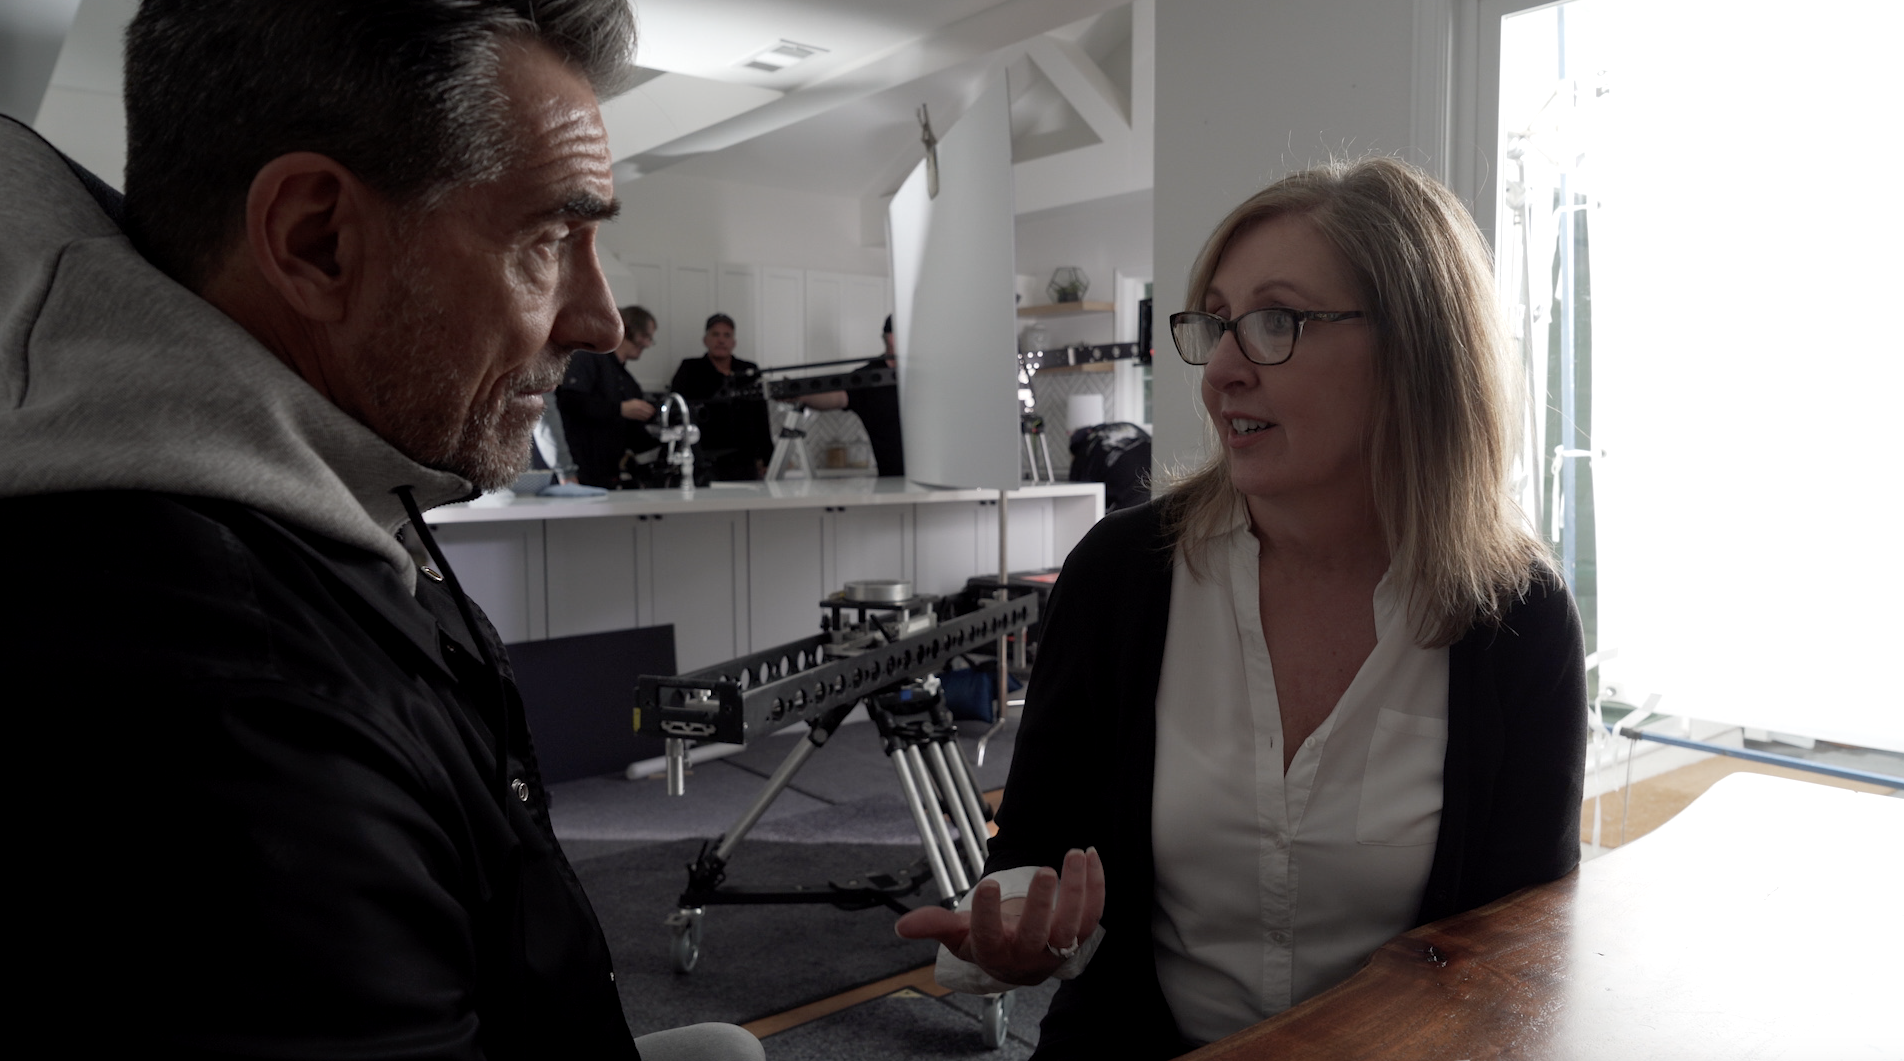 Ken Kerry Interviews Deb Mudway, Senior Vice President of Global Marketing at Helen of Troy